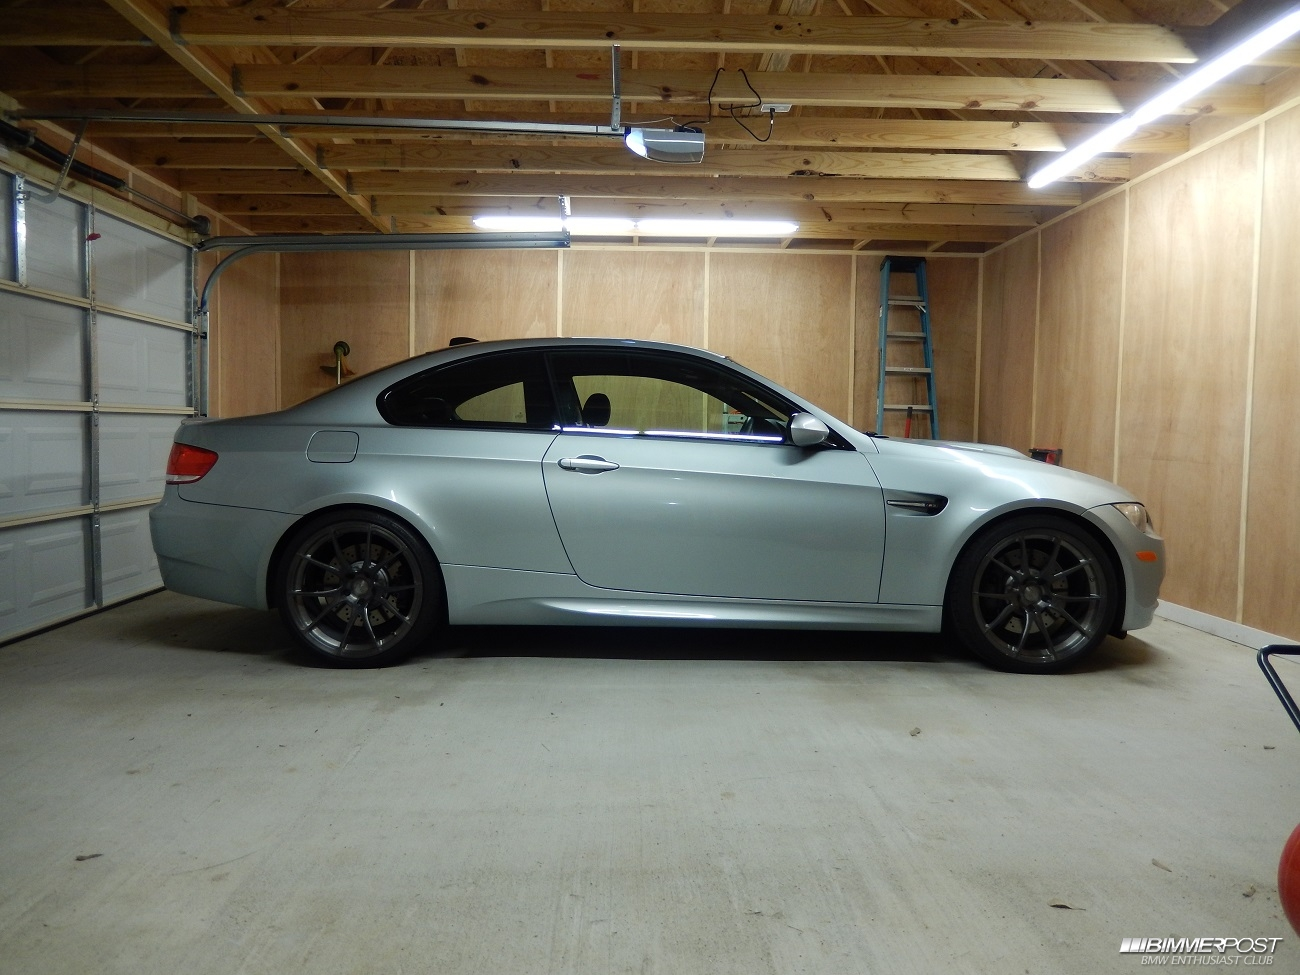 Toyo Tires Proxes >> squartus's 2010 E92 BMW M3 - BIMMERPOST Garage